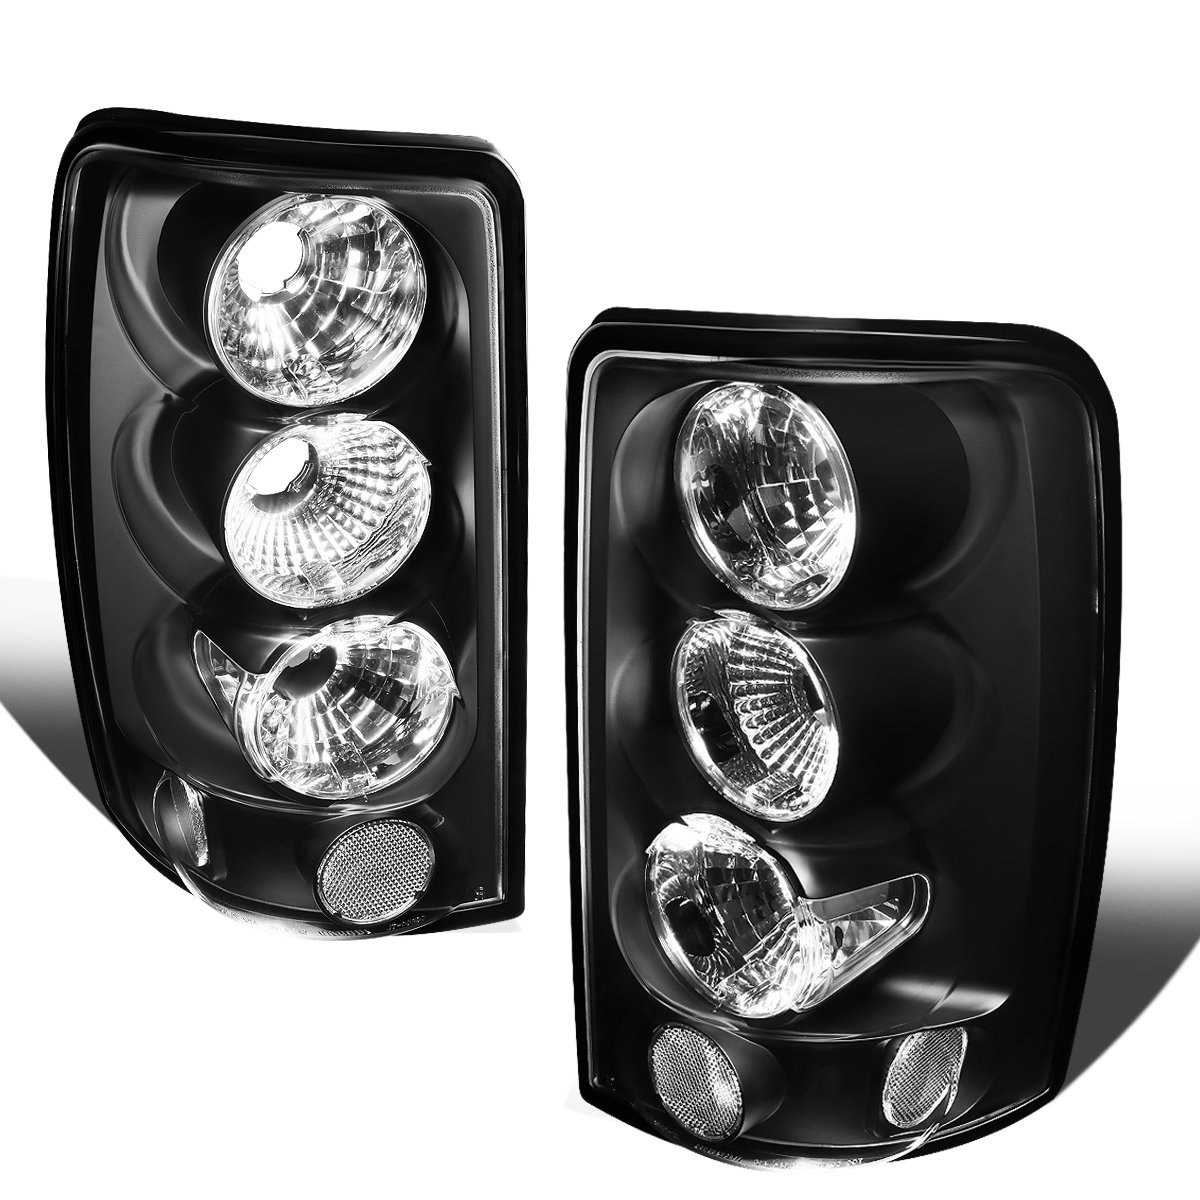 For 2000-2006 GMC Yukon XL/Chevy Tahoe Suburban Pair Black Housing Altezza Style Tail Light Brake Lamps Auto Dynasty